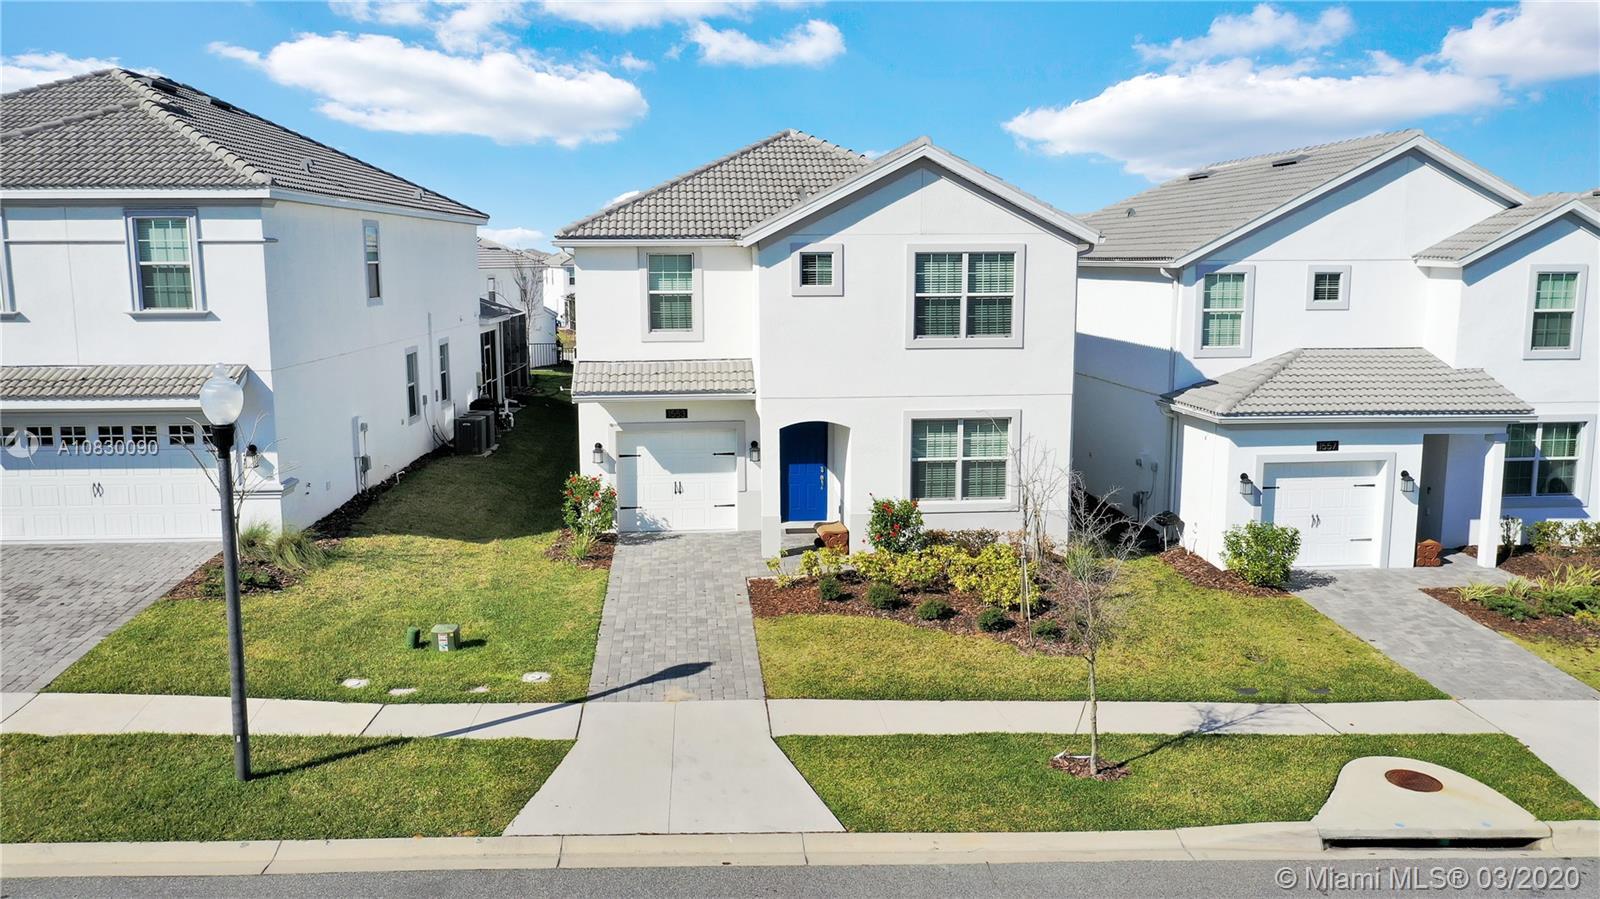 1557 Mulligan Blvd, Davenport, FL 33896